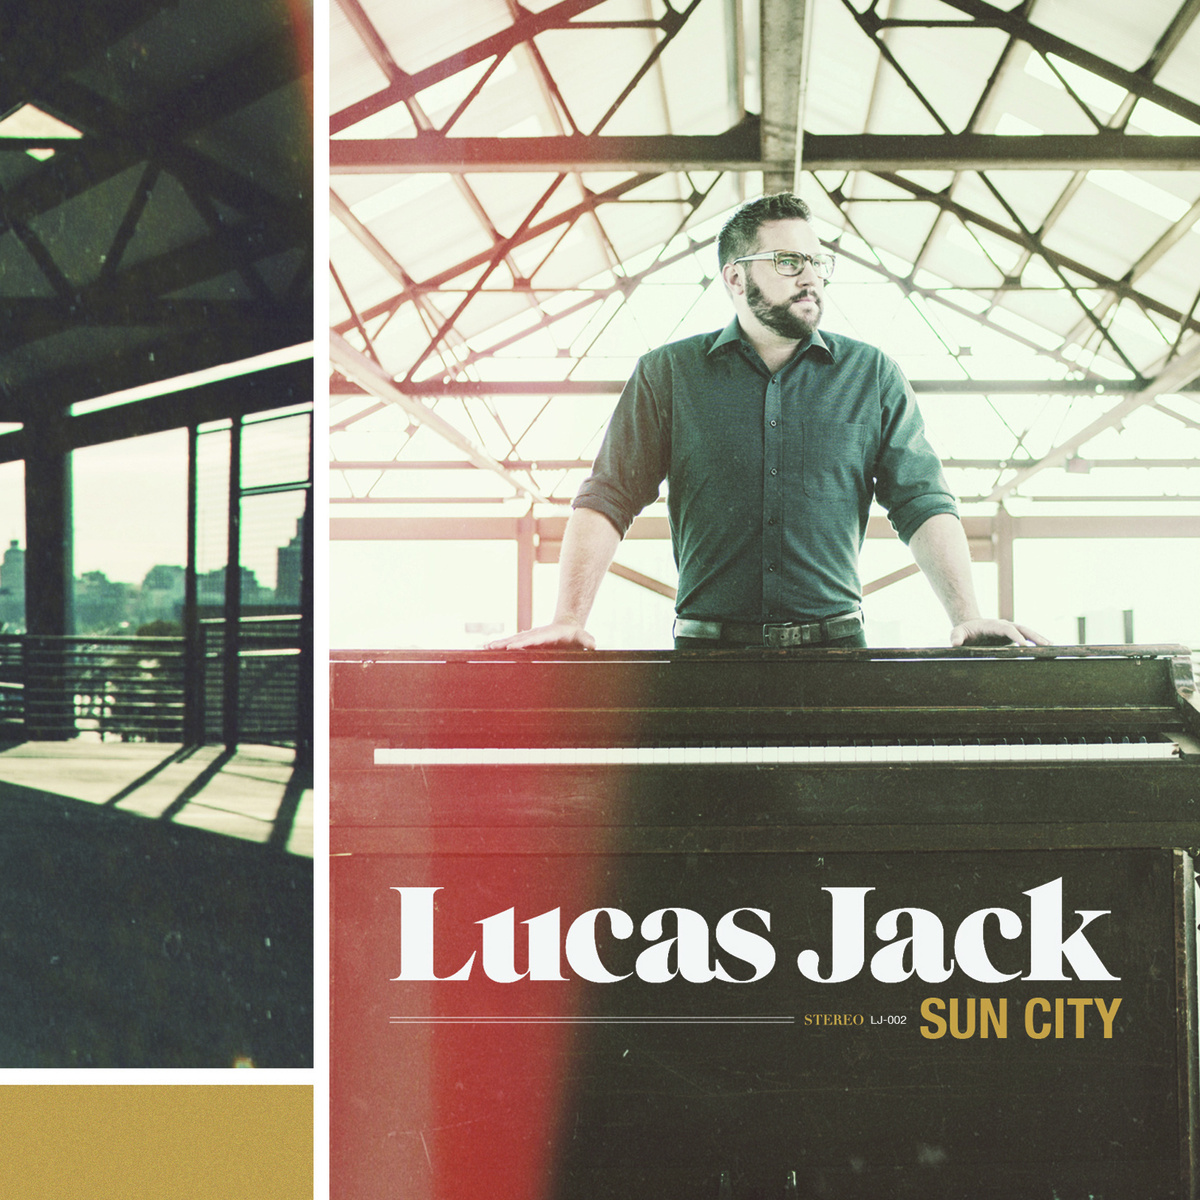 """Sun City"" by Lucas Jack (2013)"